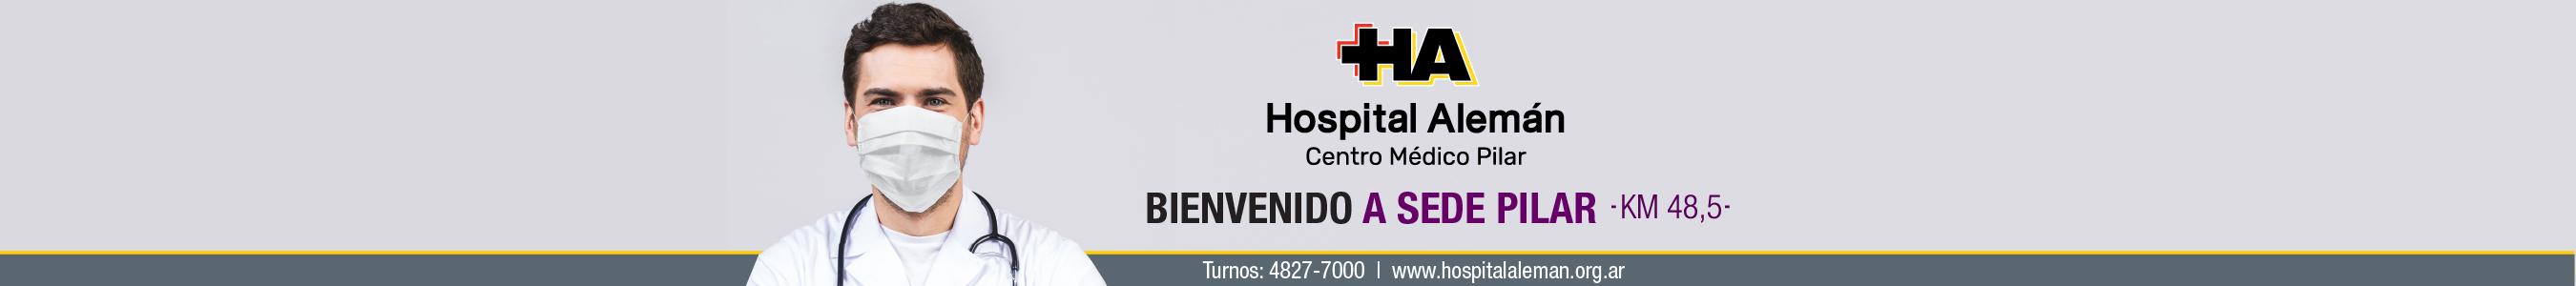 BannerWeb_Centro-Medico-Pilar